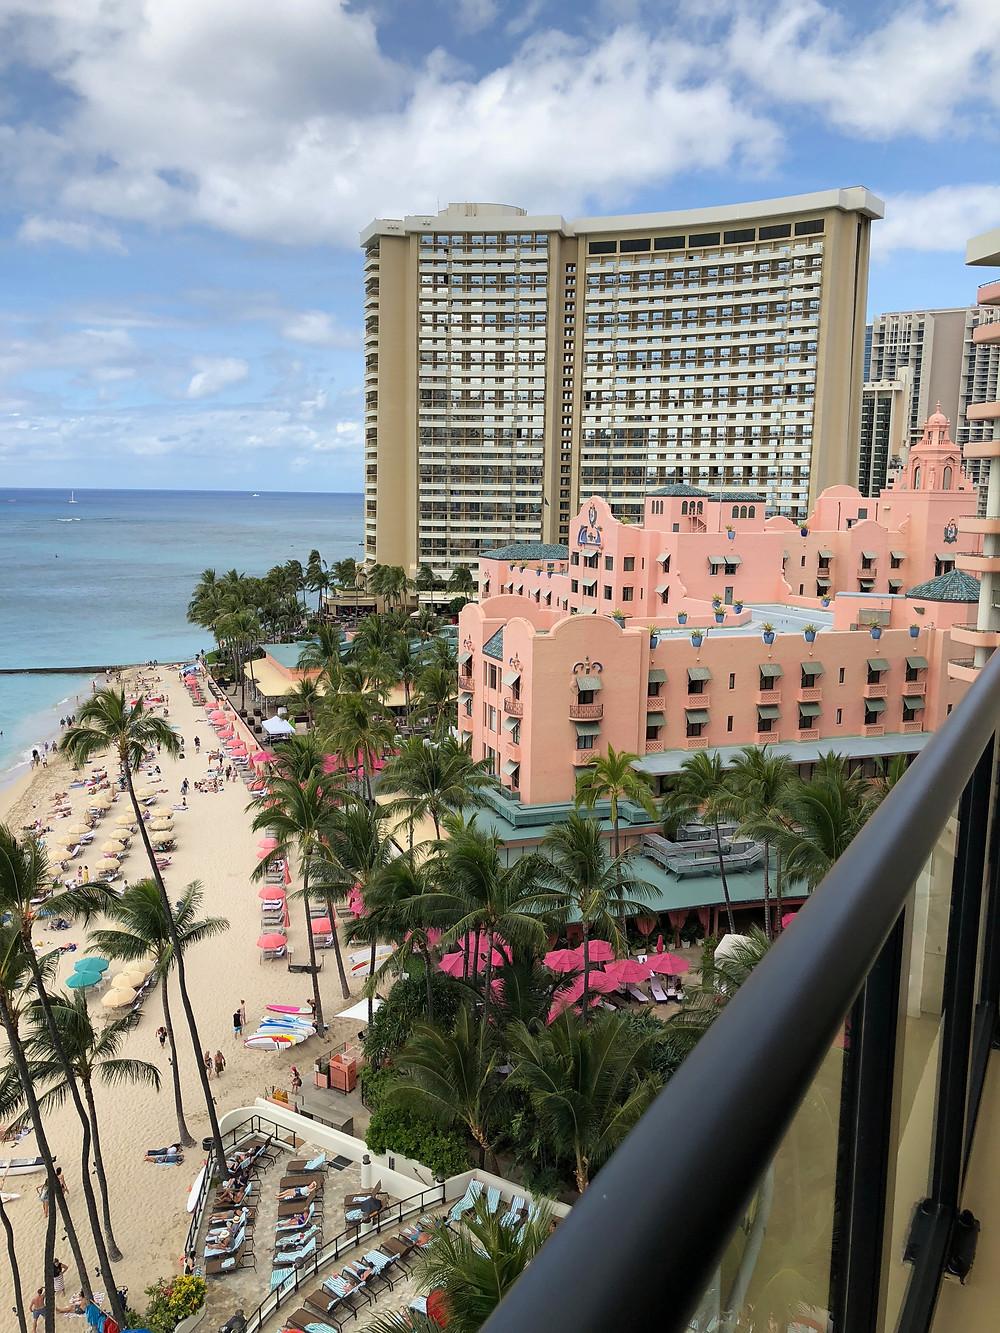 Looking towards the historic Royal Hawaiian Hotel (pink) and it's next door neighbor, the Sheraton Waikiki from the a lanai at Outrigger Waikiki Beach